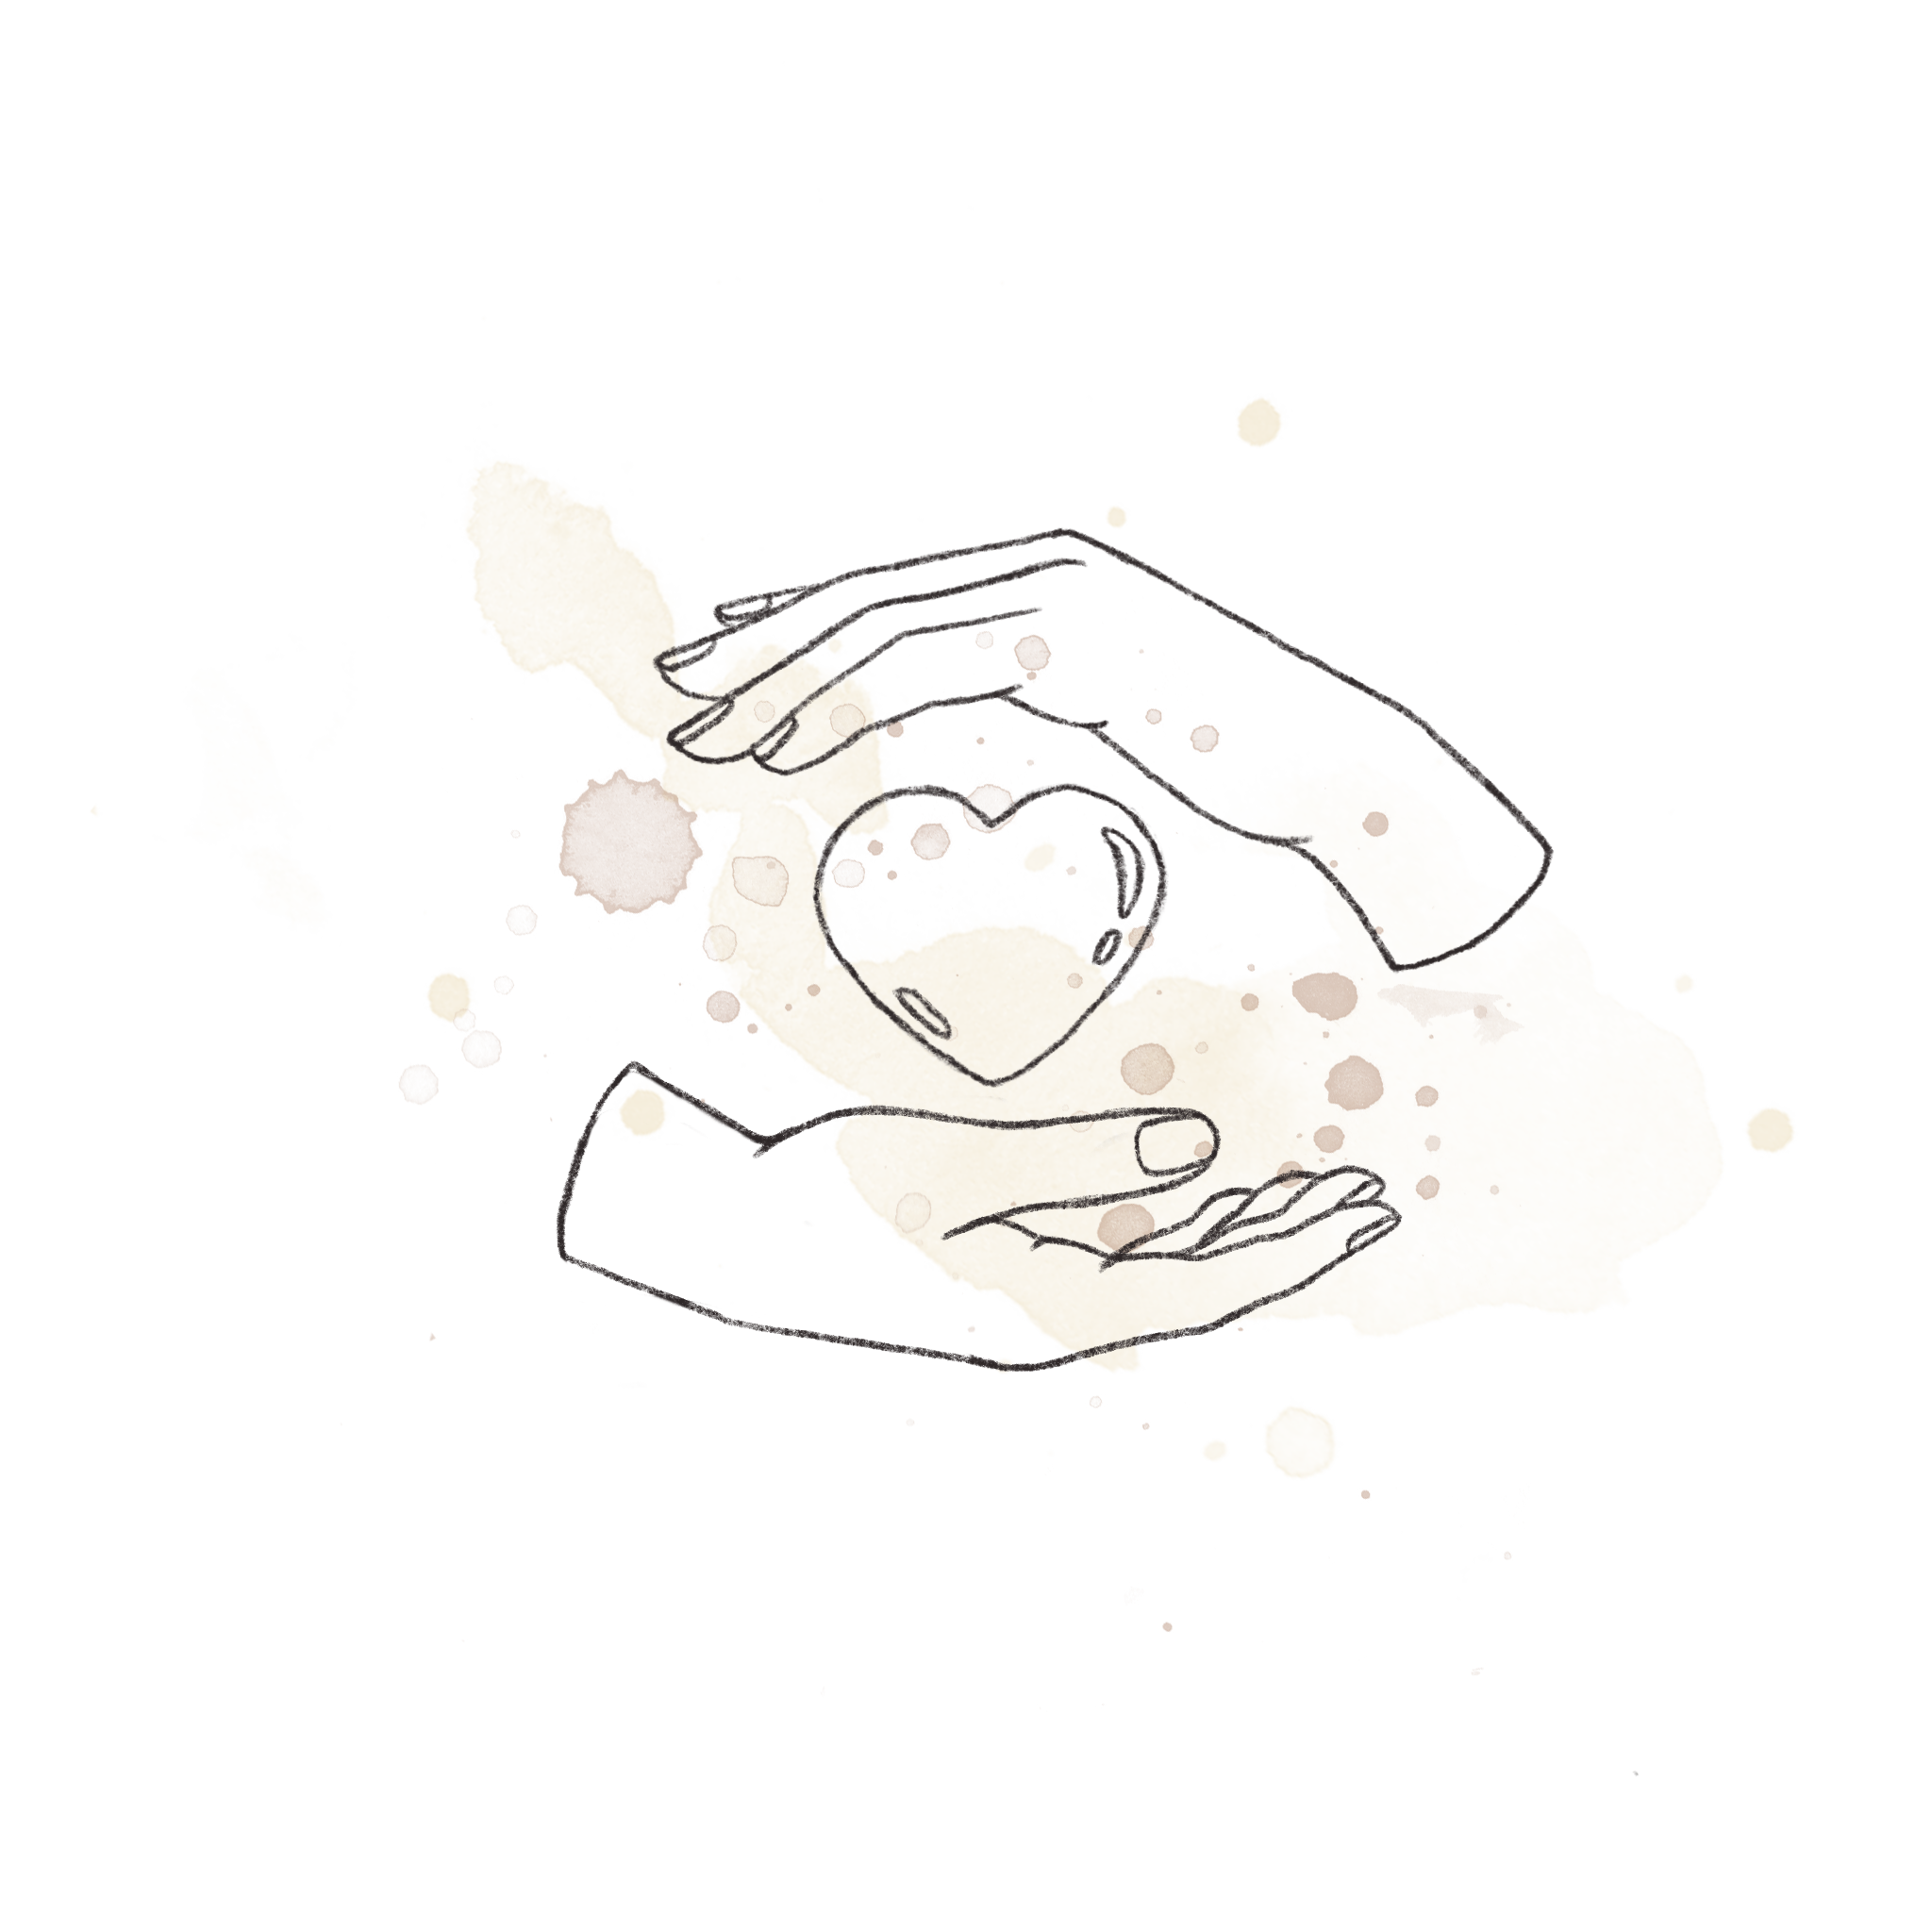 Sabrina Riccio Hand Illustration